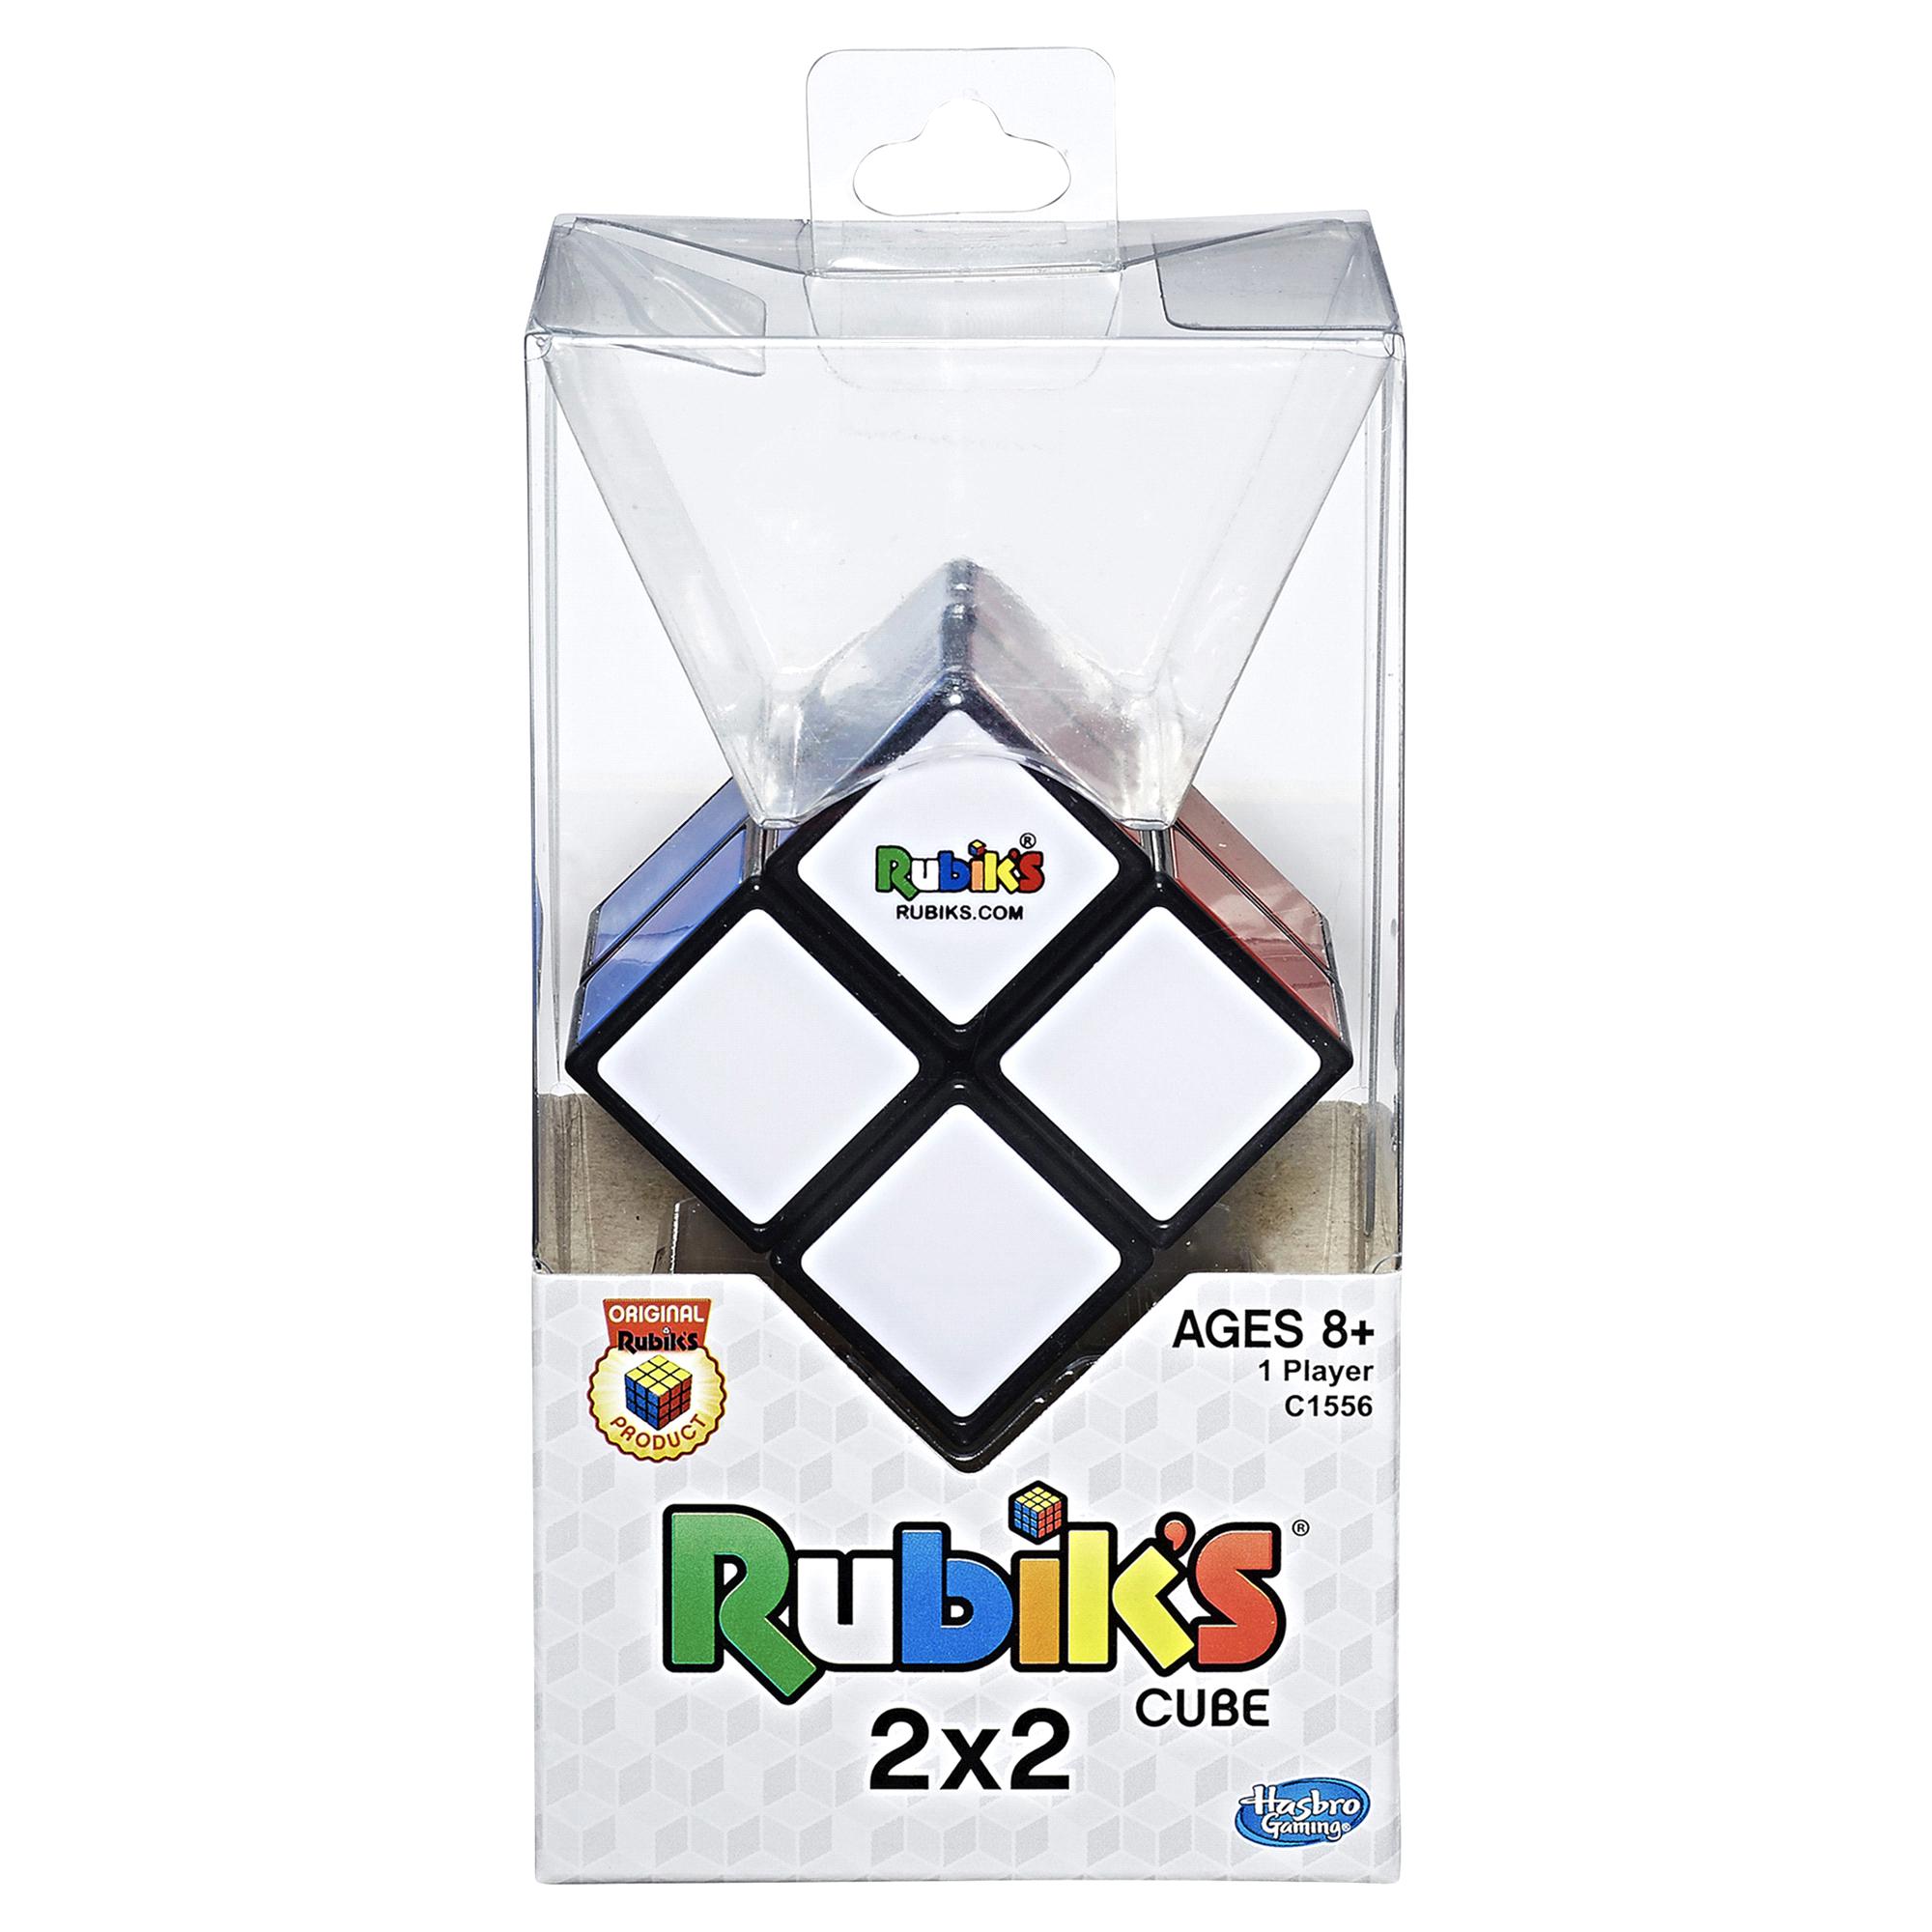 Rubiks 2X2 Cube   Meijer.com